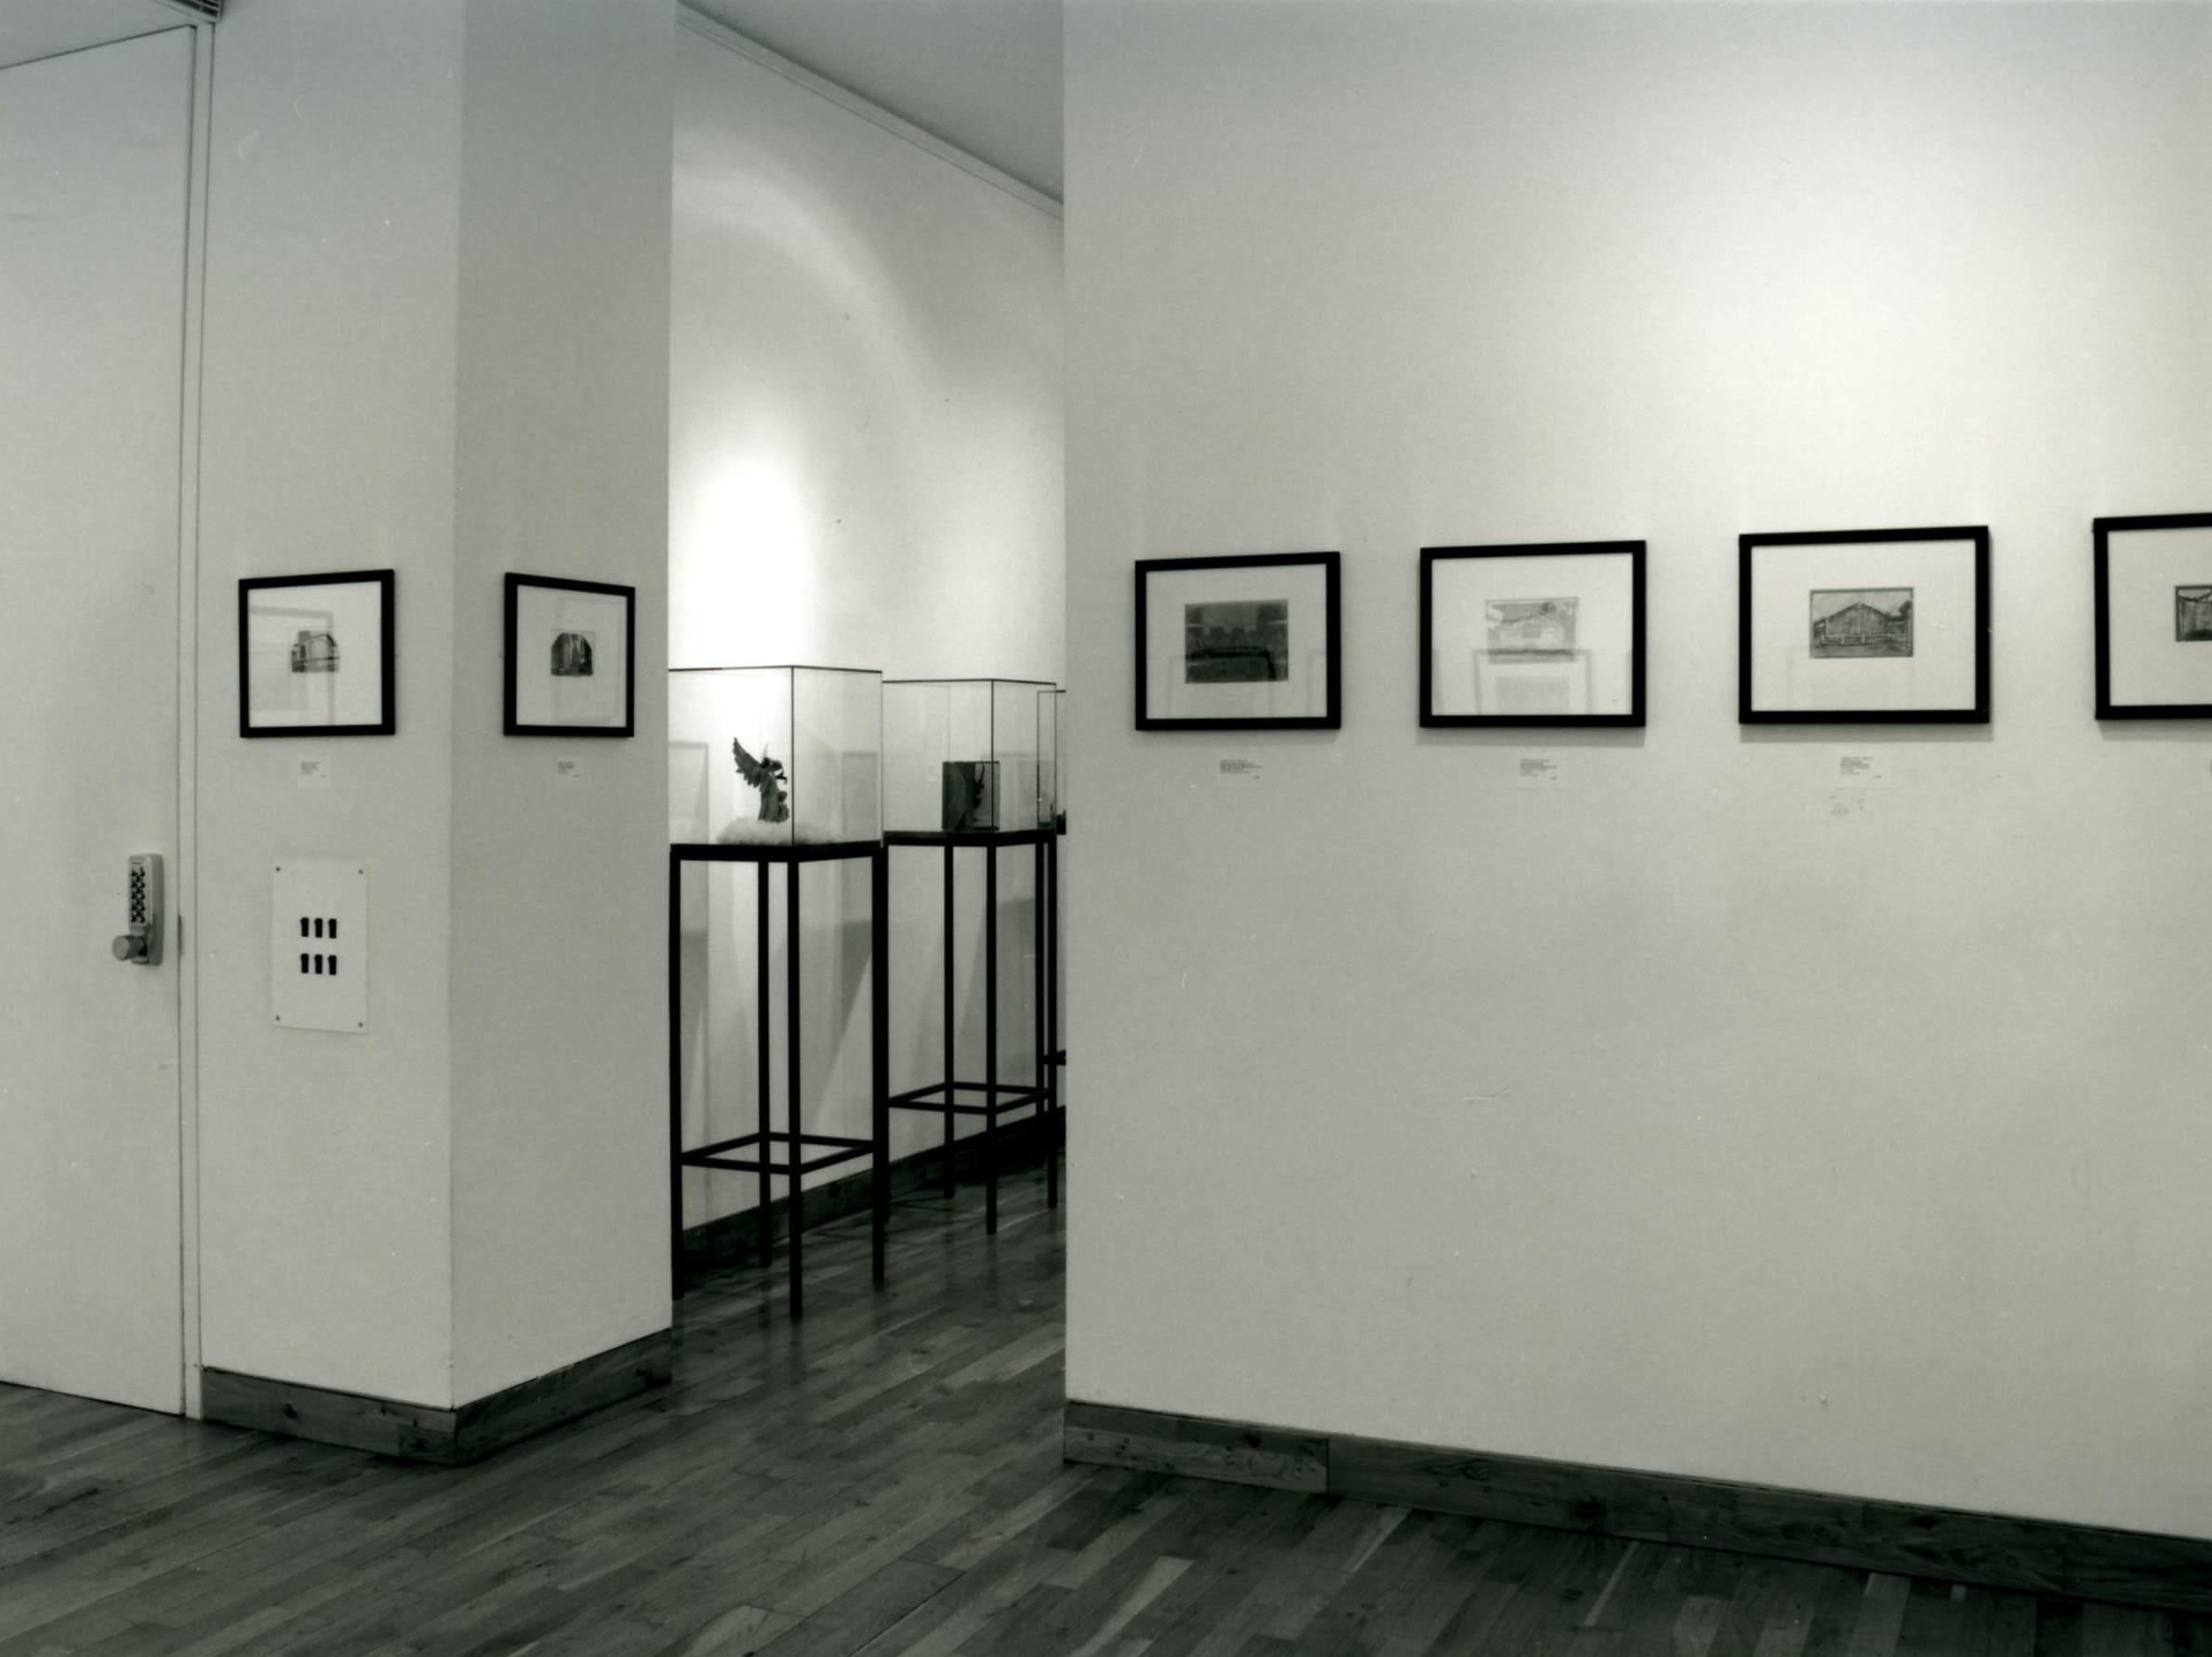 "<span class=""link fancybox-details-link""><a href=""/exhibitions/144/works/image_standalone593/"">View Detail Page</a></span><p>JAMES CASTLE | 1900 - 1977 | 27 NOV - 20 DEC 2001 | Installation View</p>"